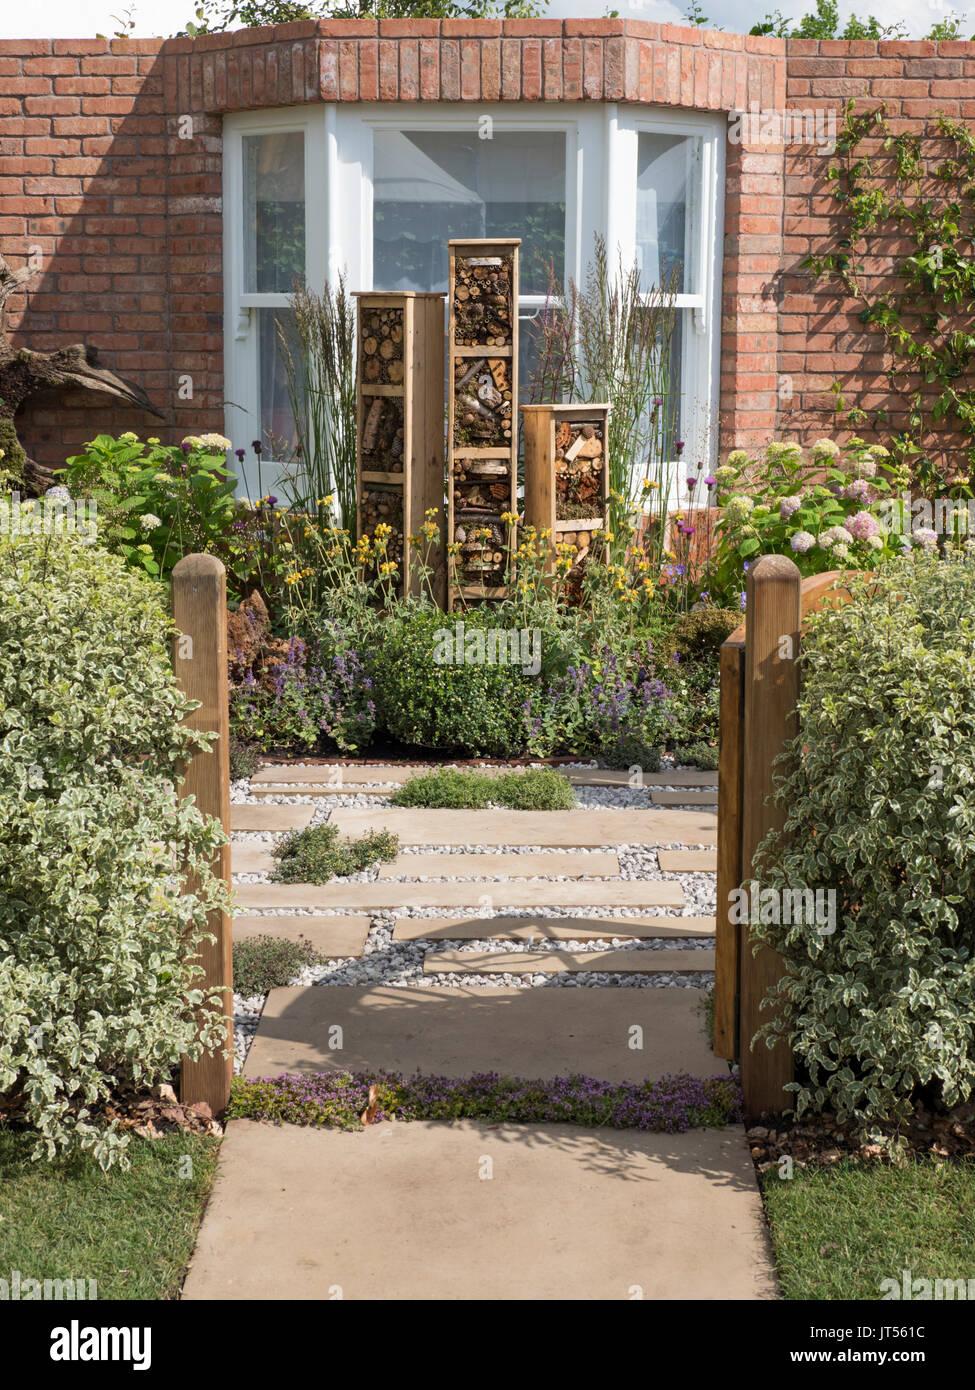 Gardeners world live Artemis Landscapes 'Living in Sync' Garden. - Stock Image